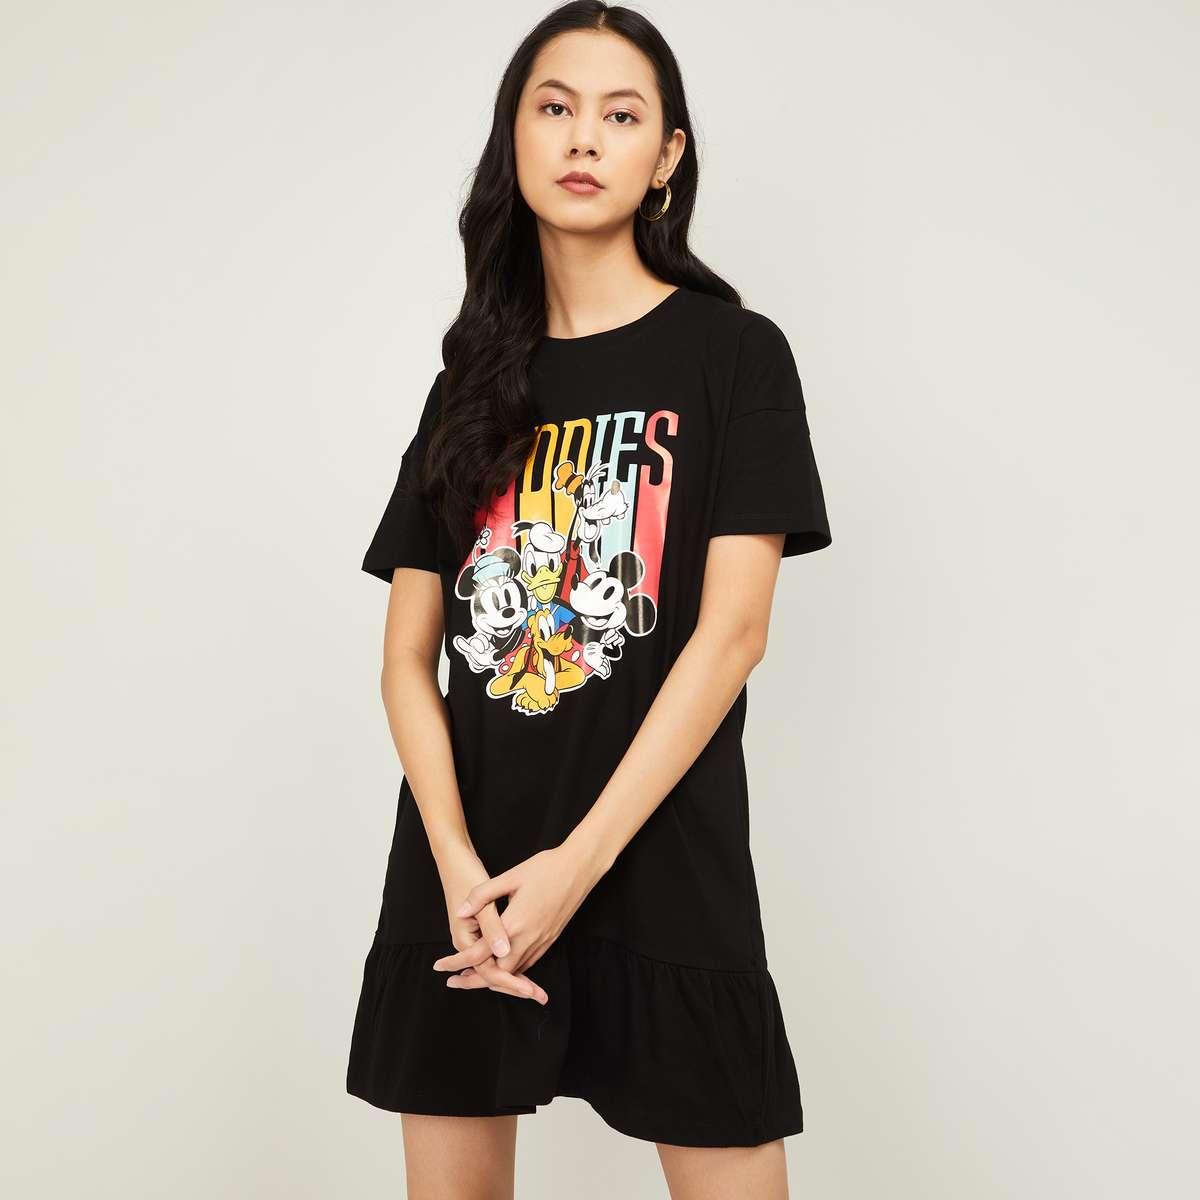 7.GINGER Women Graphic Print Short Sleeves T-shirt Dress